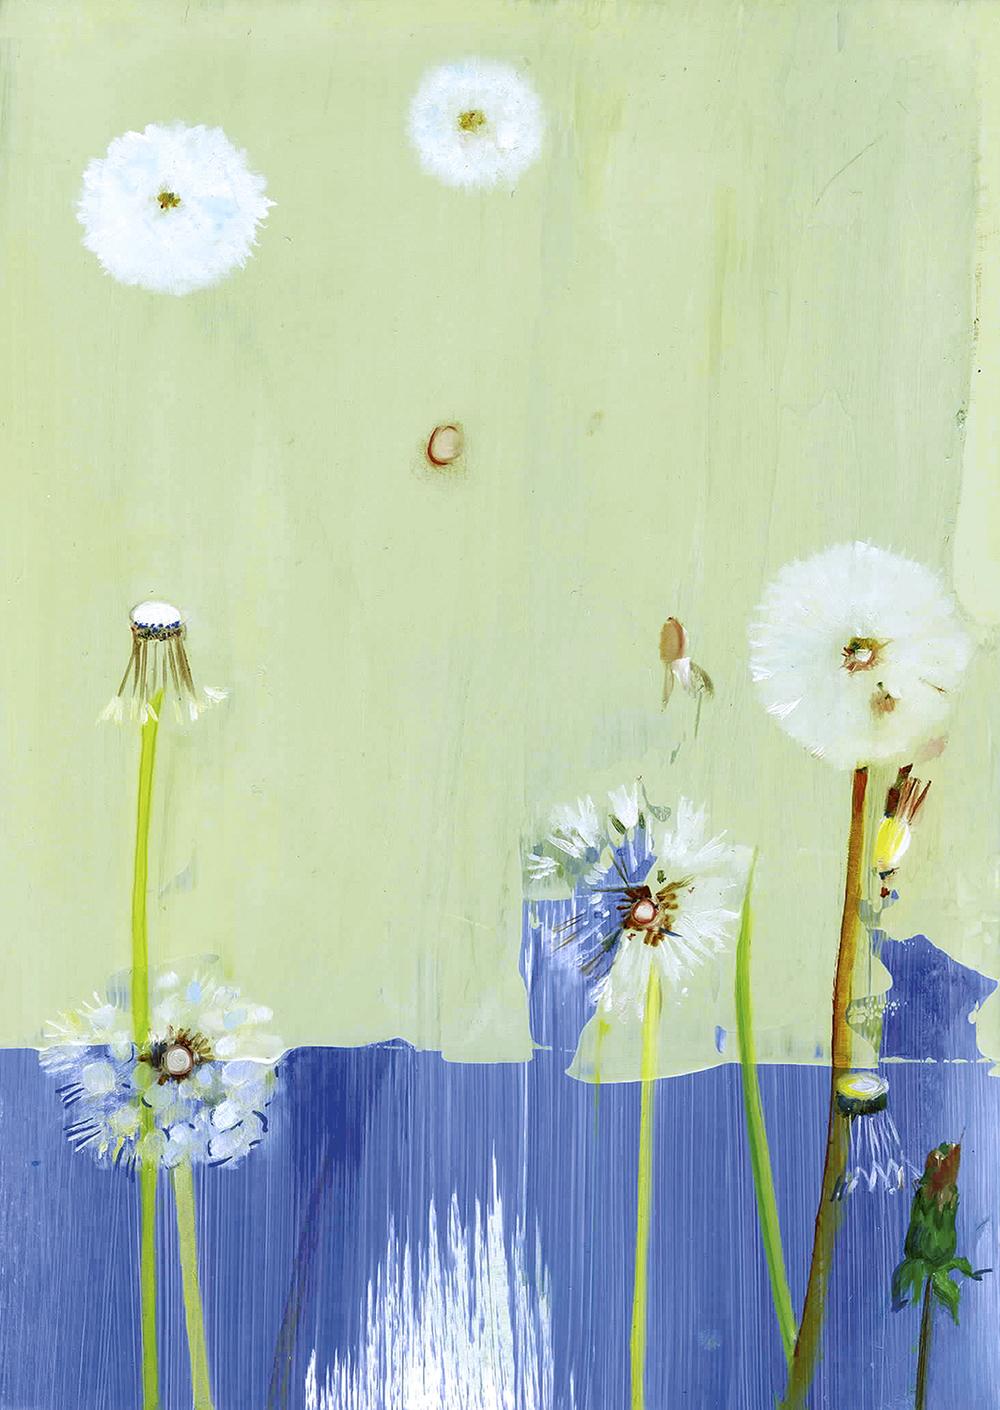 Dandelions oil on panel 7x5, 2005